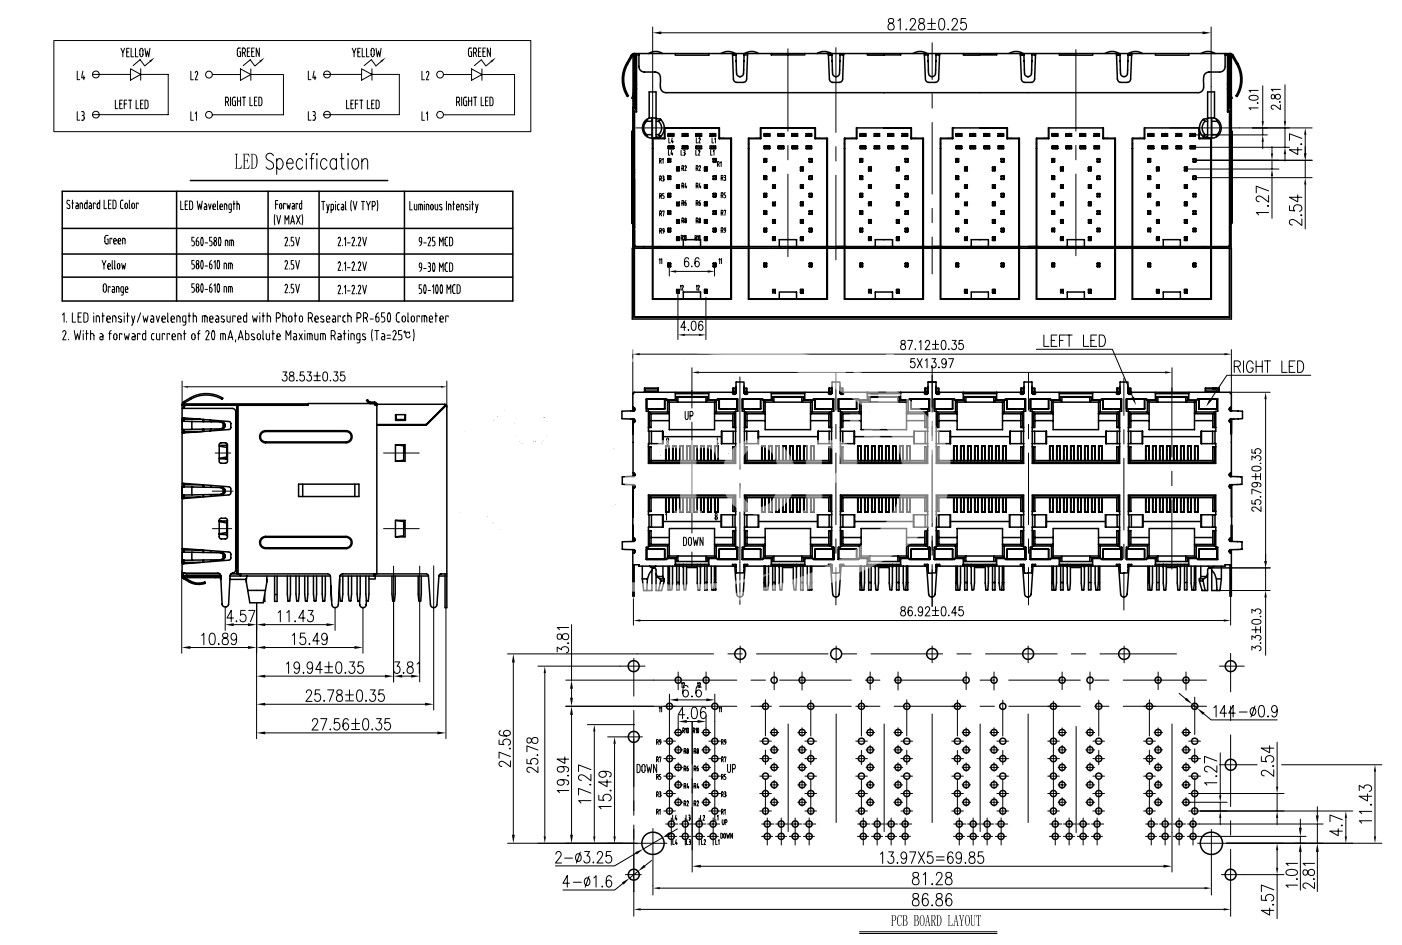 gigabit poe wiring diagram travel trailer battery 43 rj45 2x6 connectors with transformer 2xn